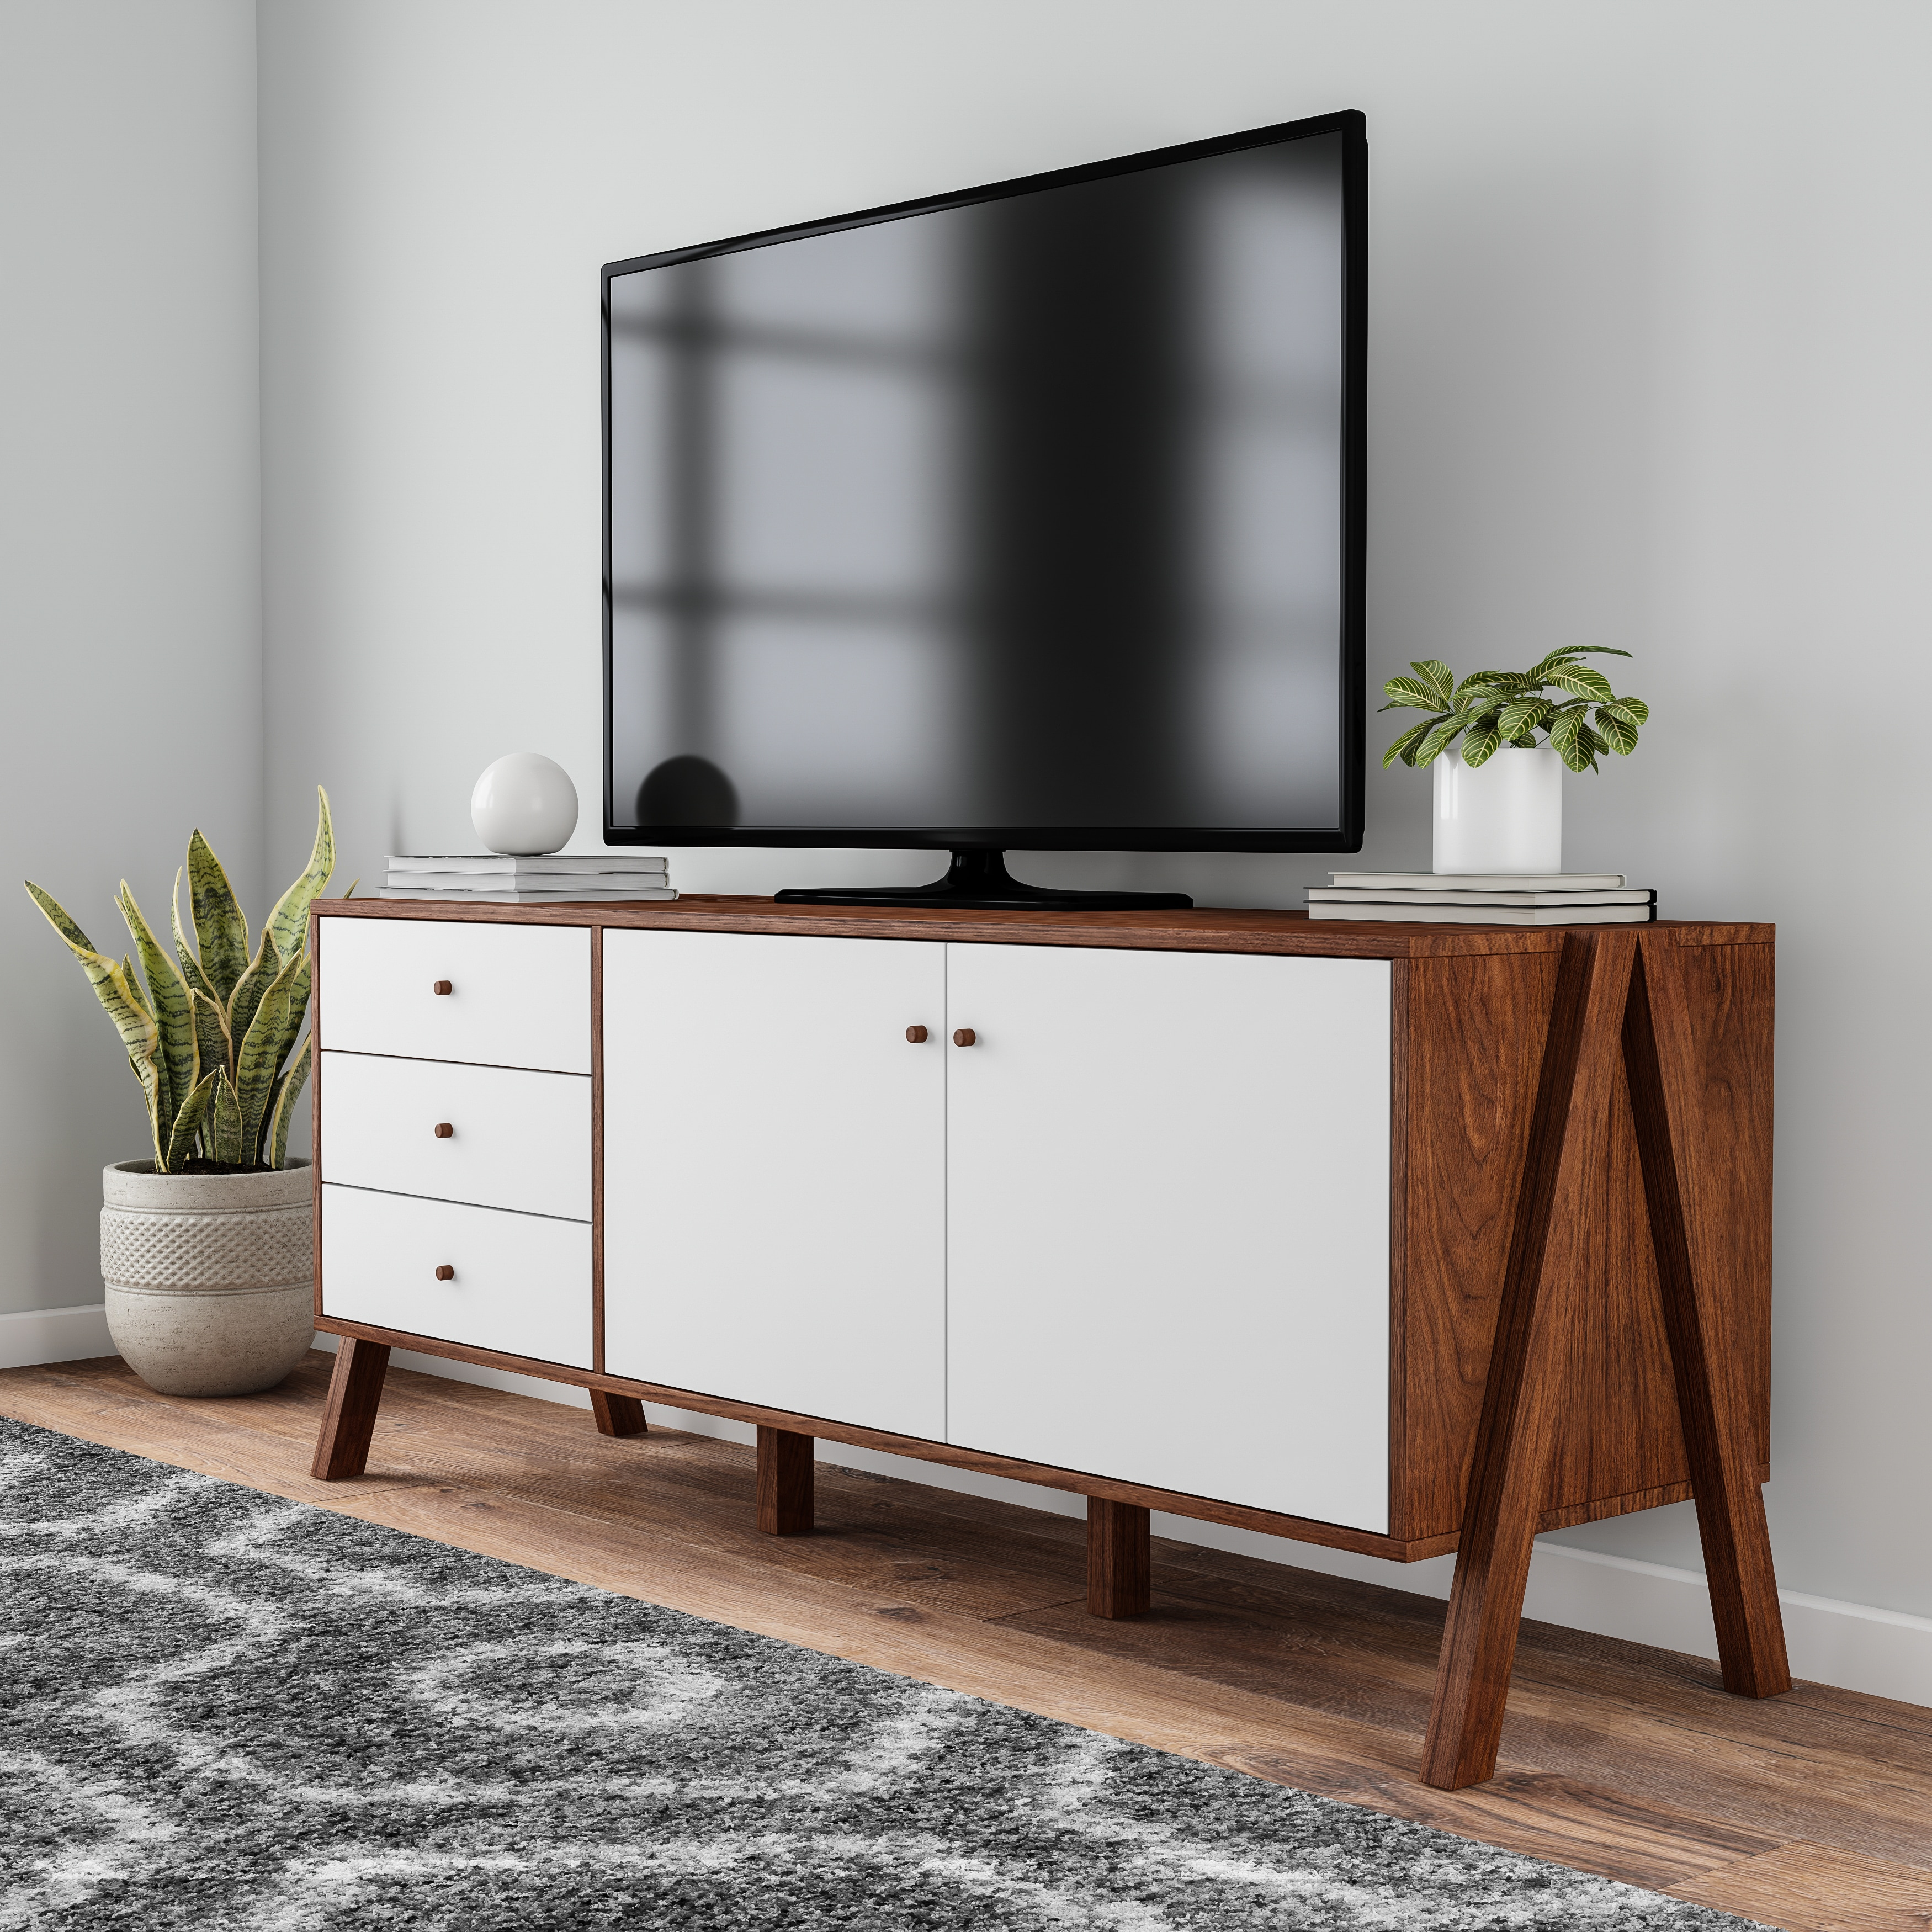 Carson carrington eskilstuna white walnut wood sideboard storage cabinet